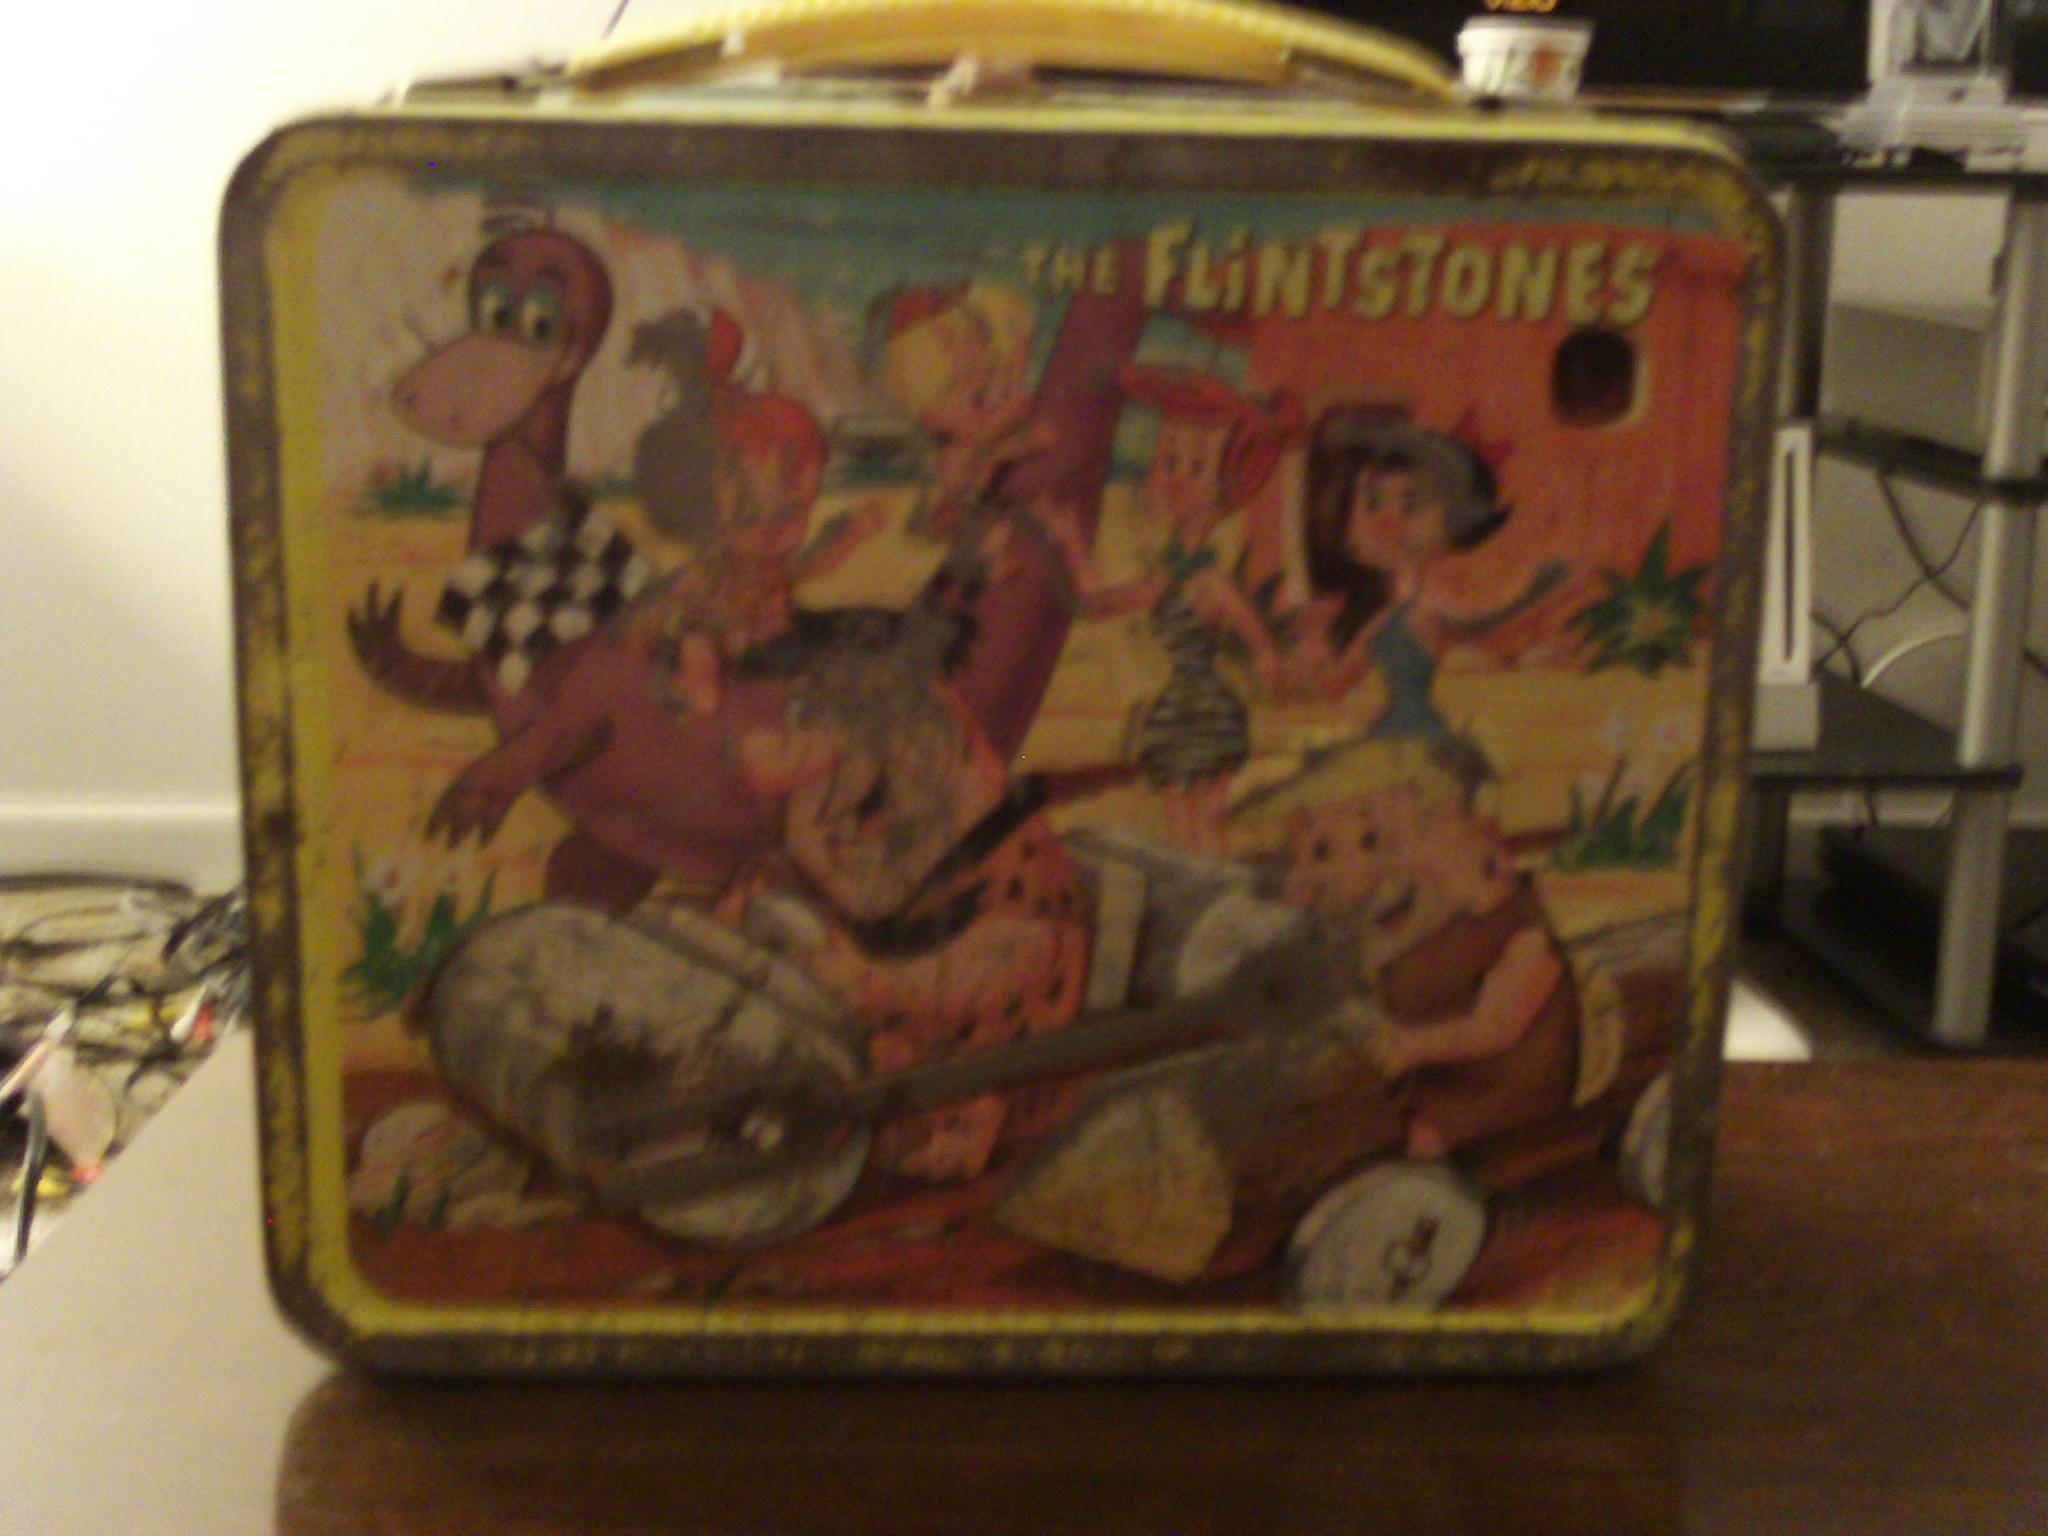 1964 Flintstones Lunch box